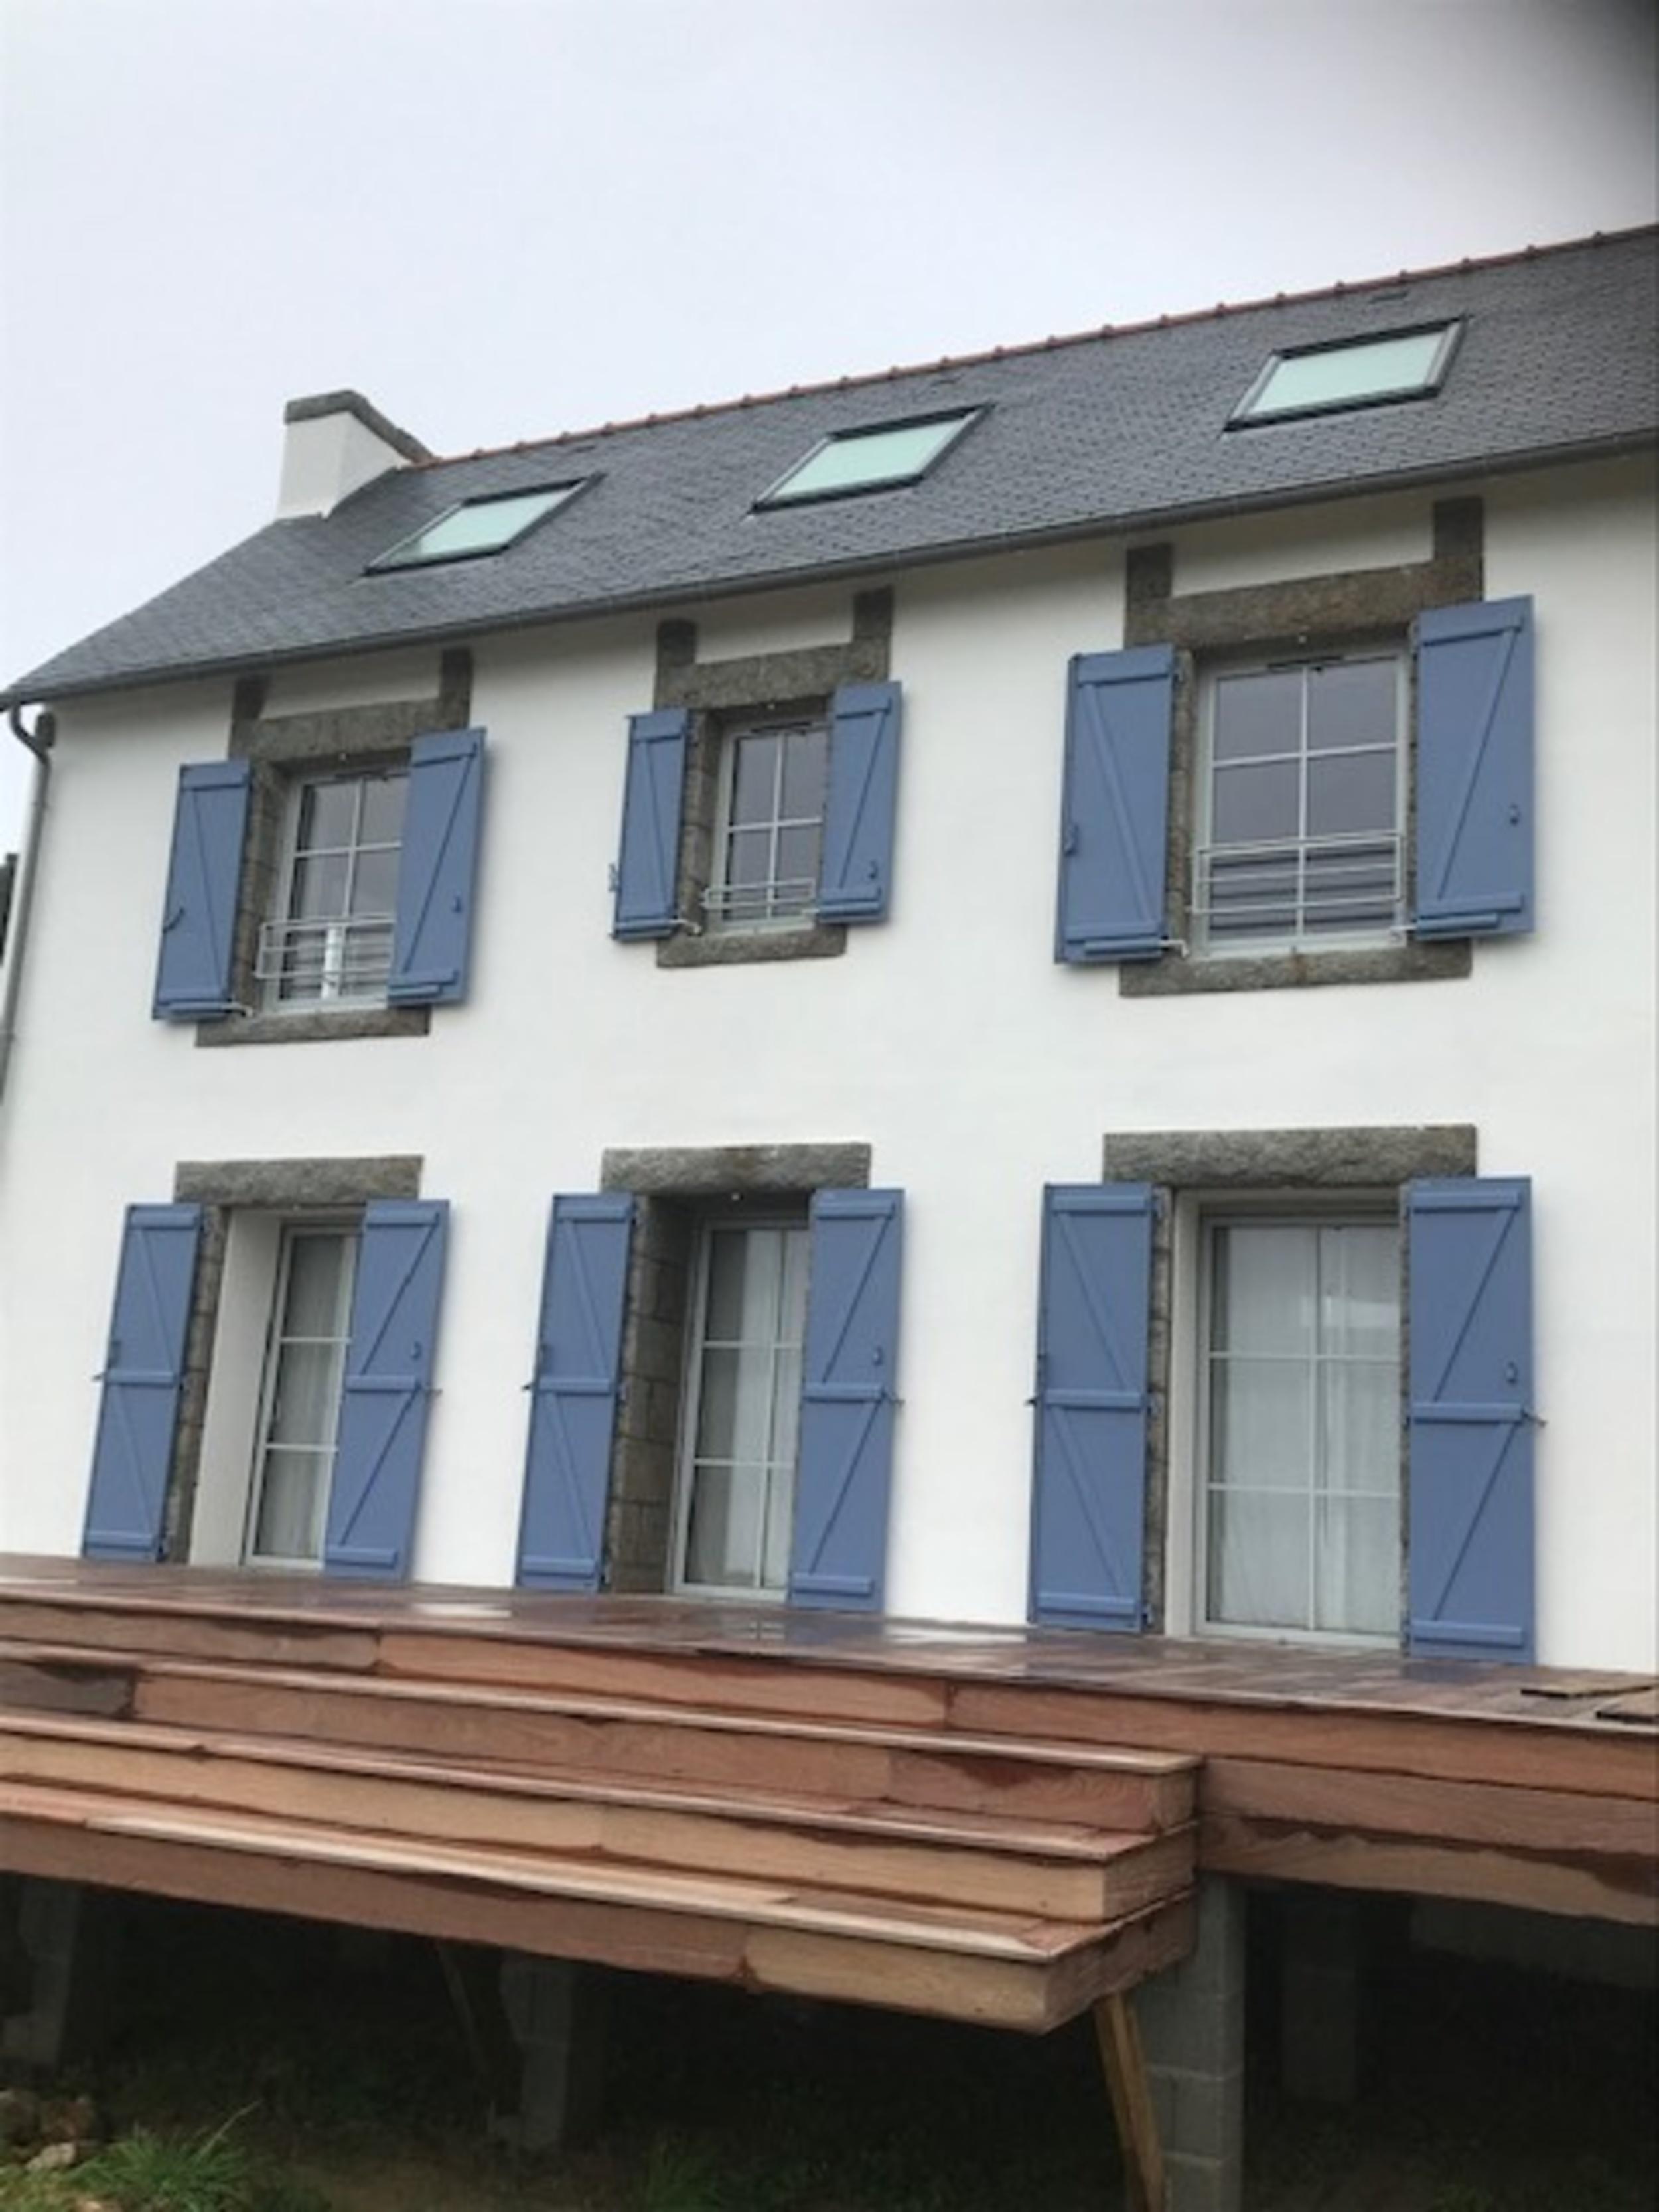 Terrasse bois et rénovation volets alu